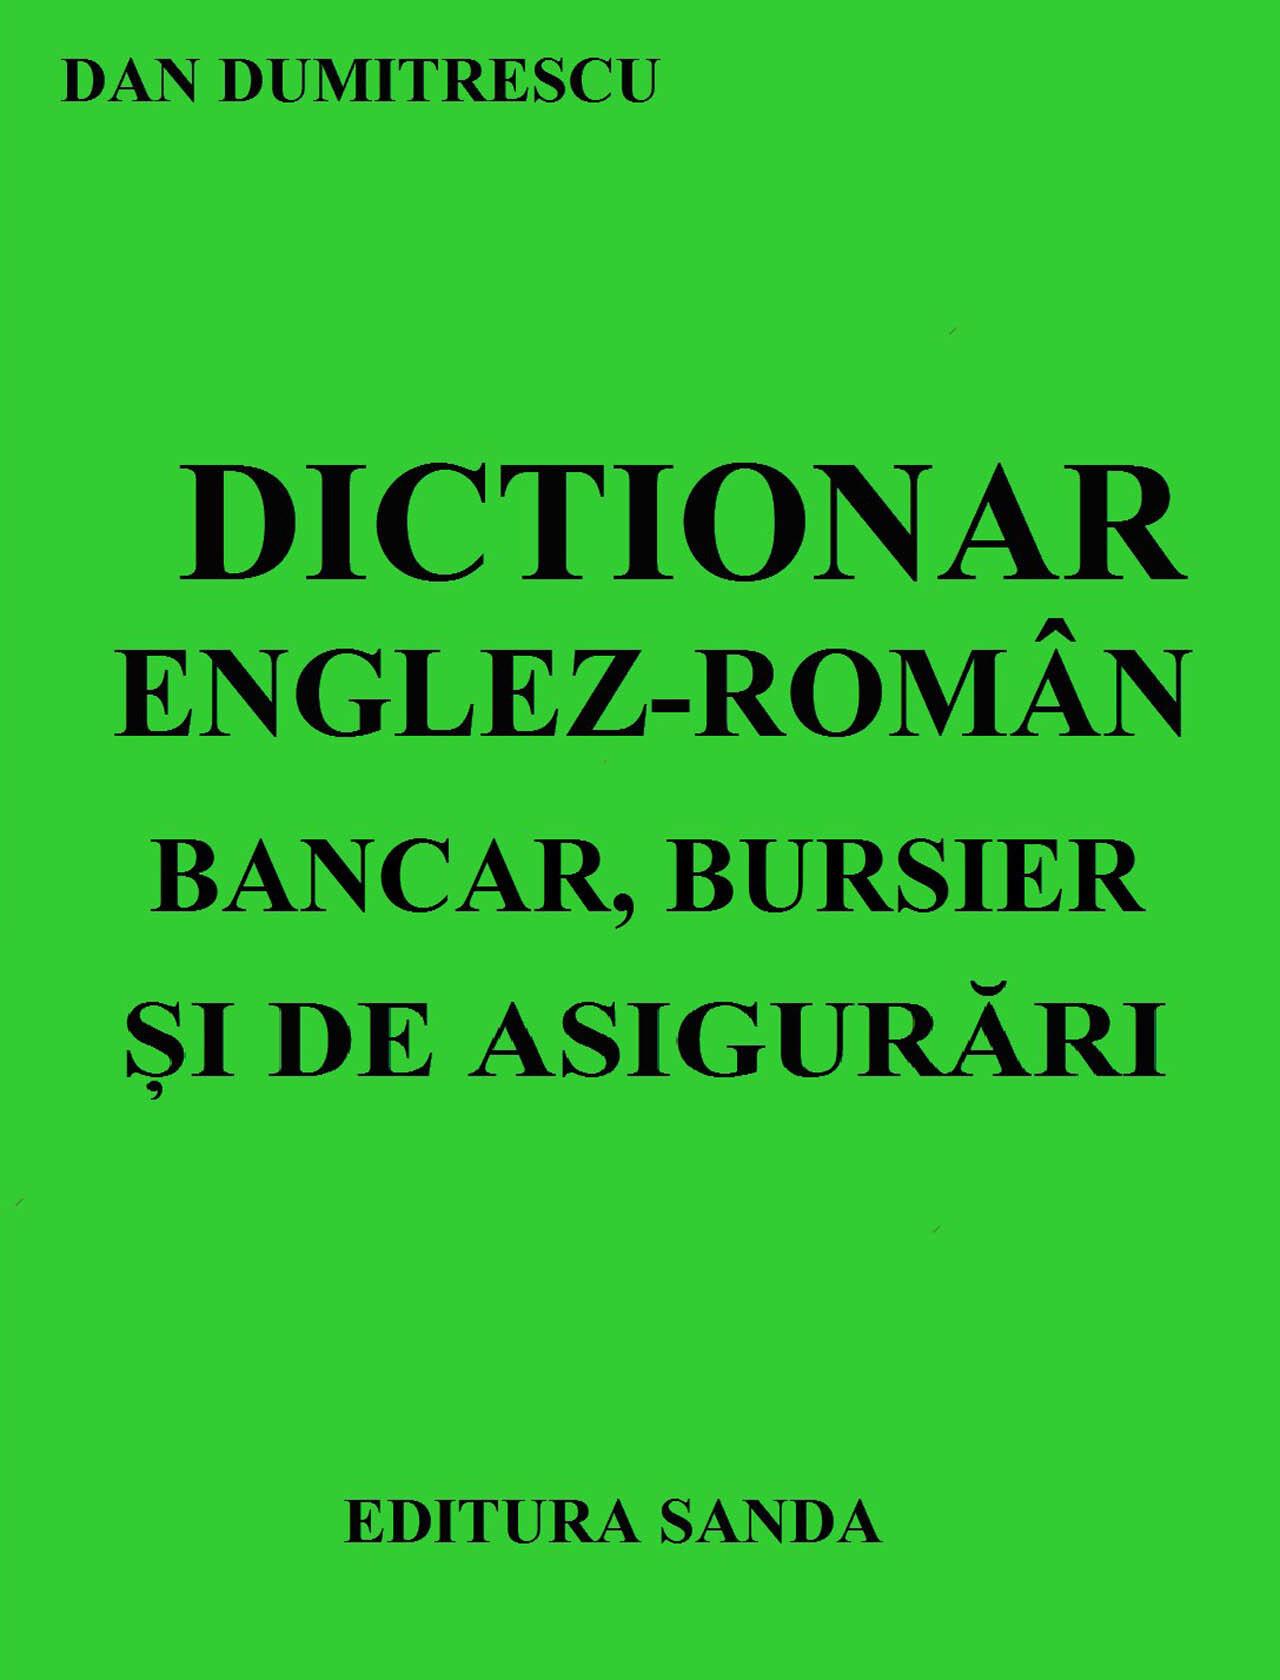 Dictionar Englez-Roman - Bancar, Bursier si de Asigurari (eBook)